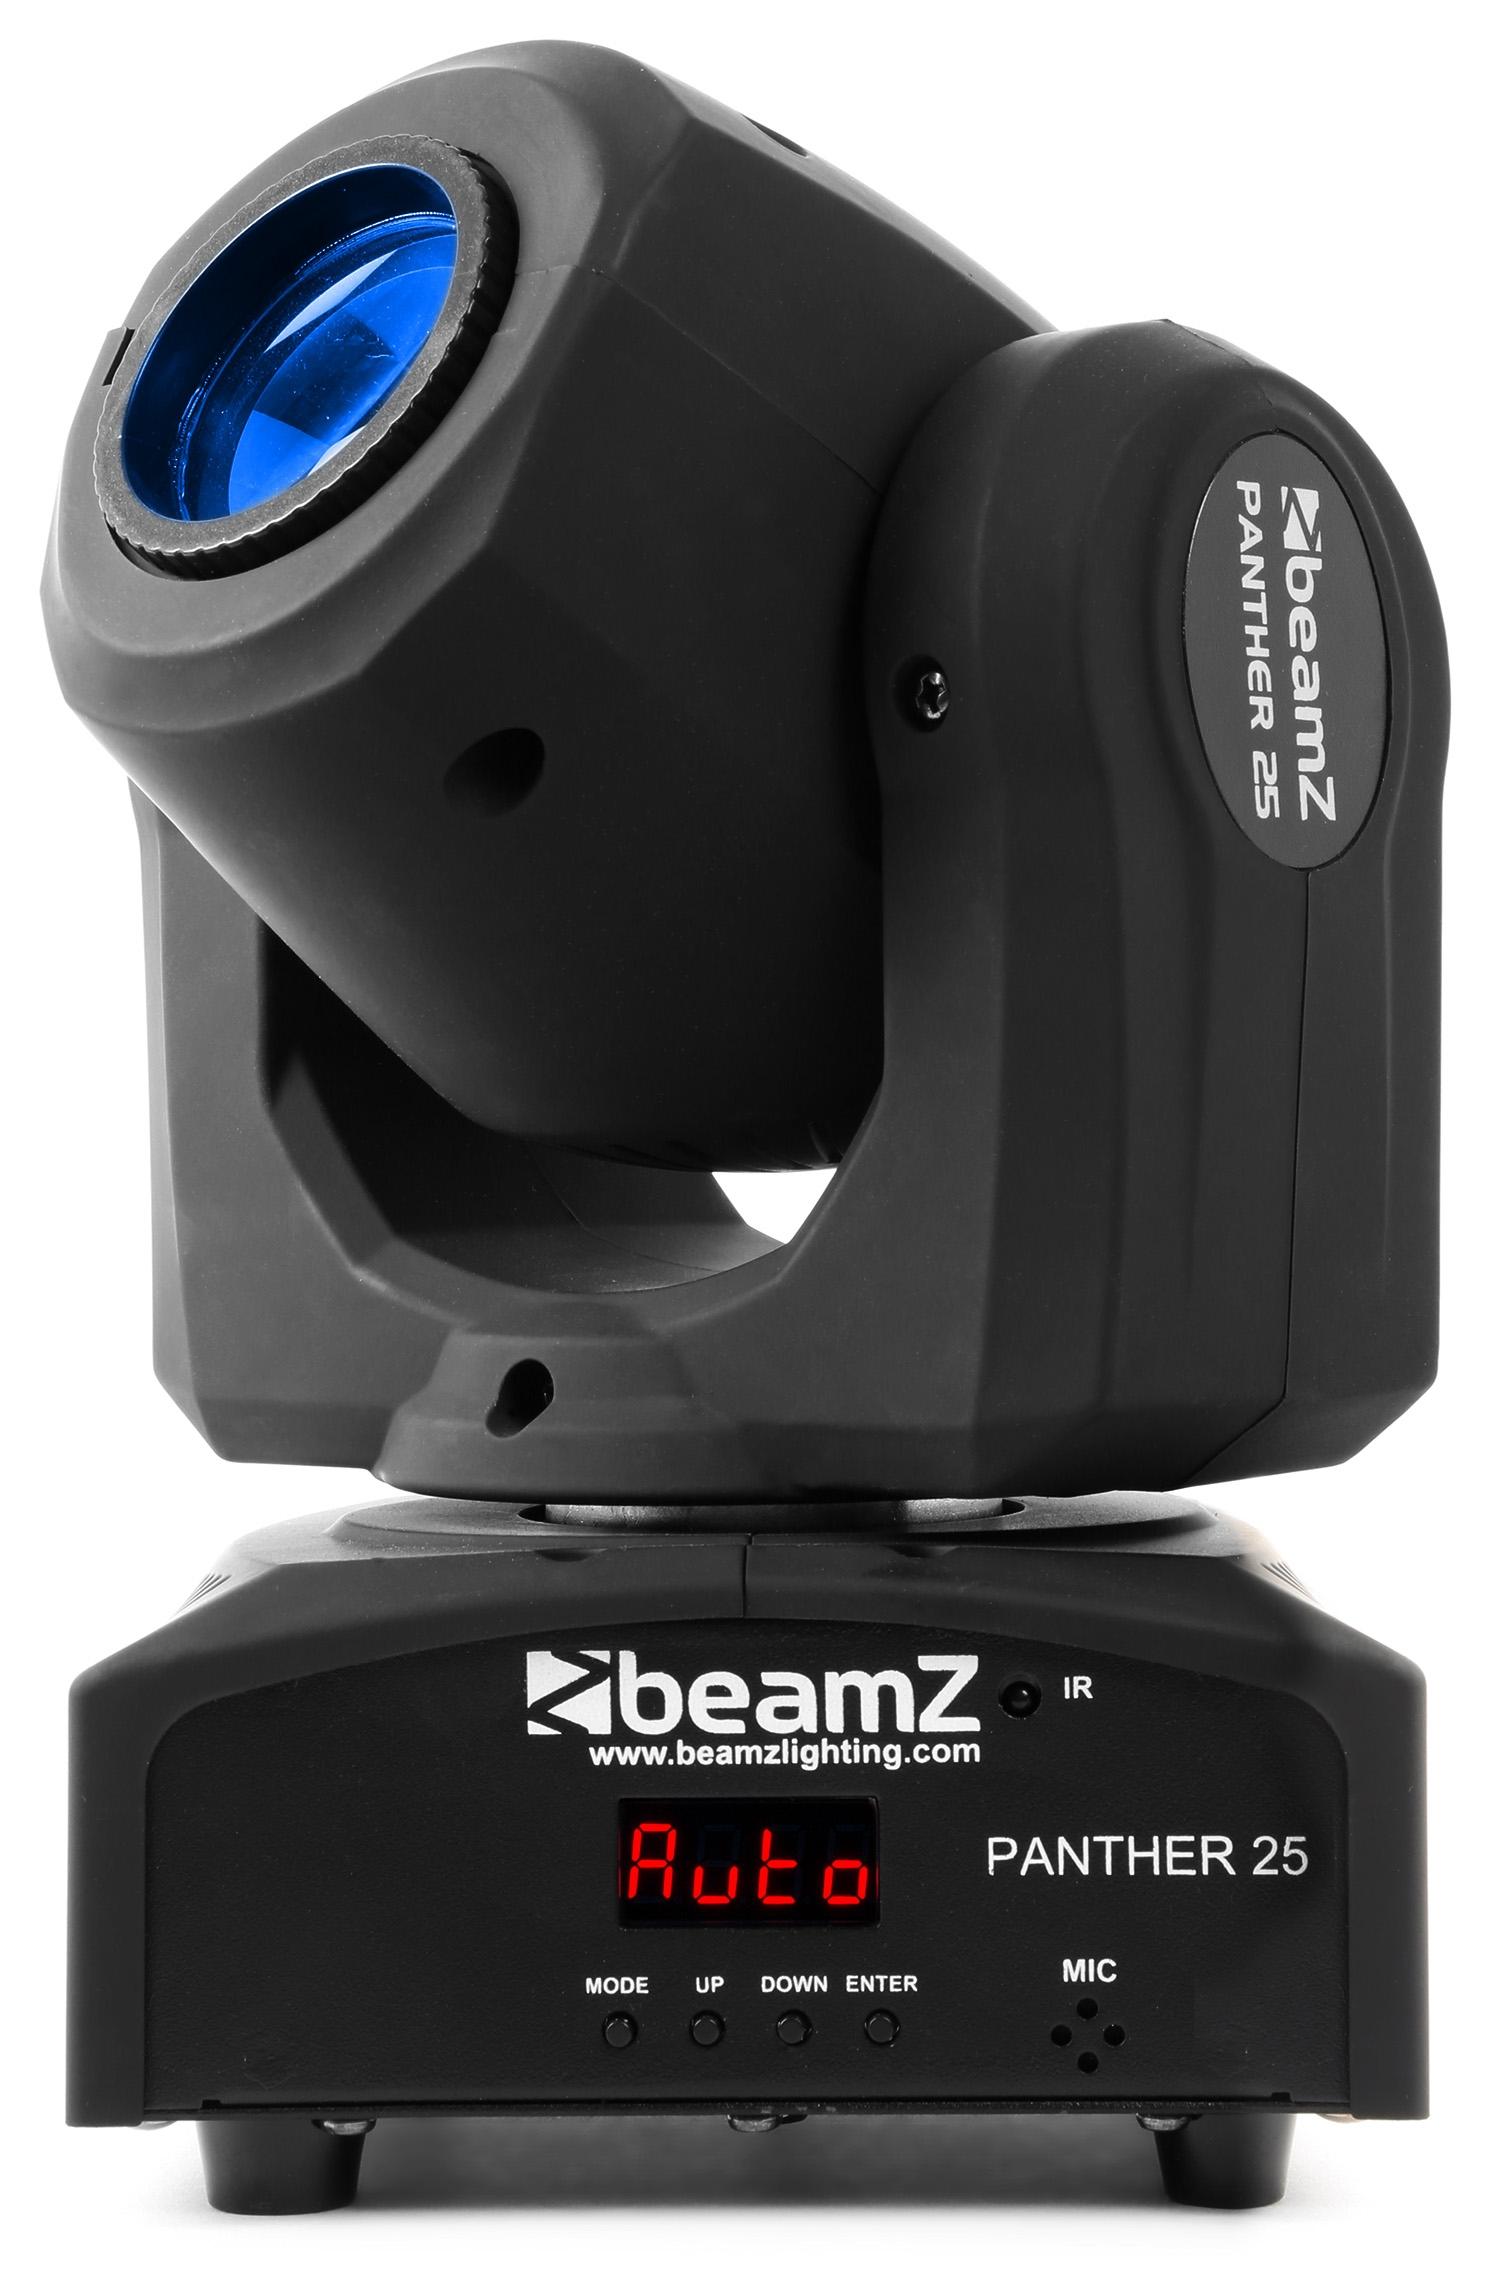 Beamz LED otočná hlavice Panther 25, 1x12W CREE LED, IR, DMX